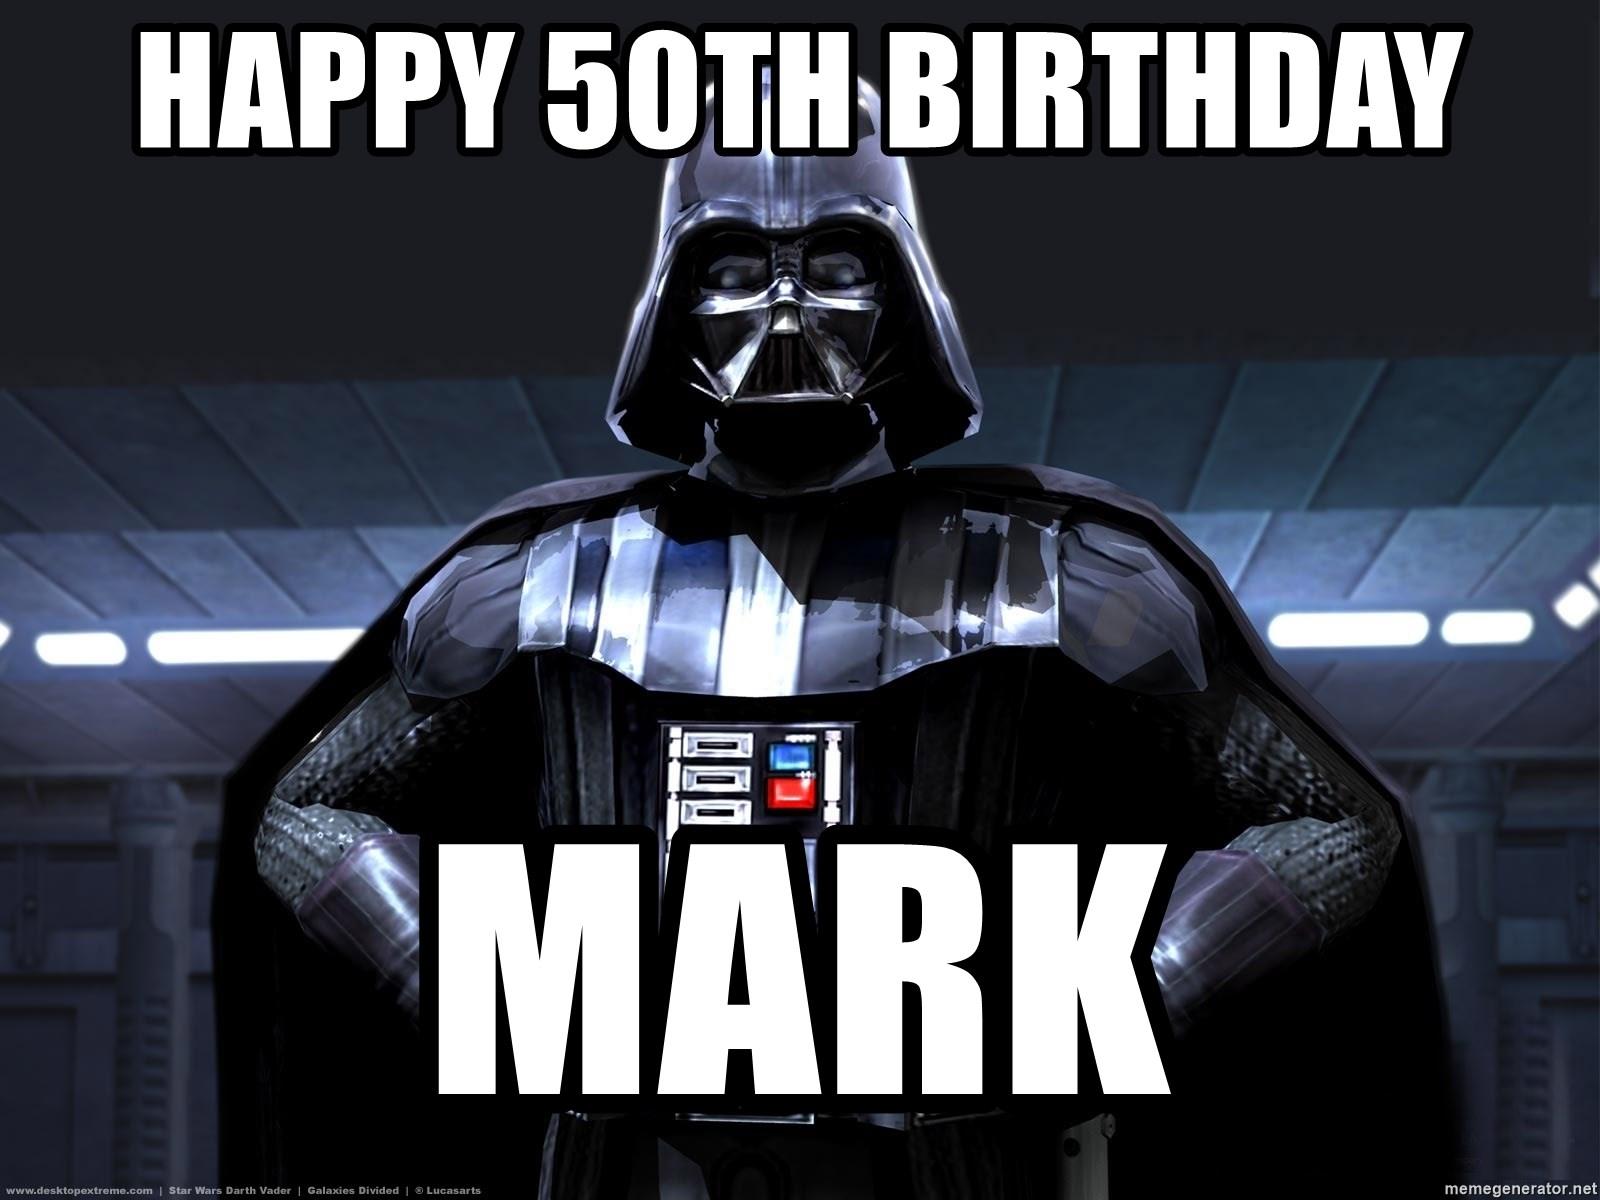 Happy 50th Birthday Mark Star Wars Darth Vader Meme